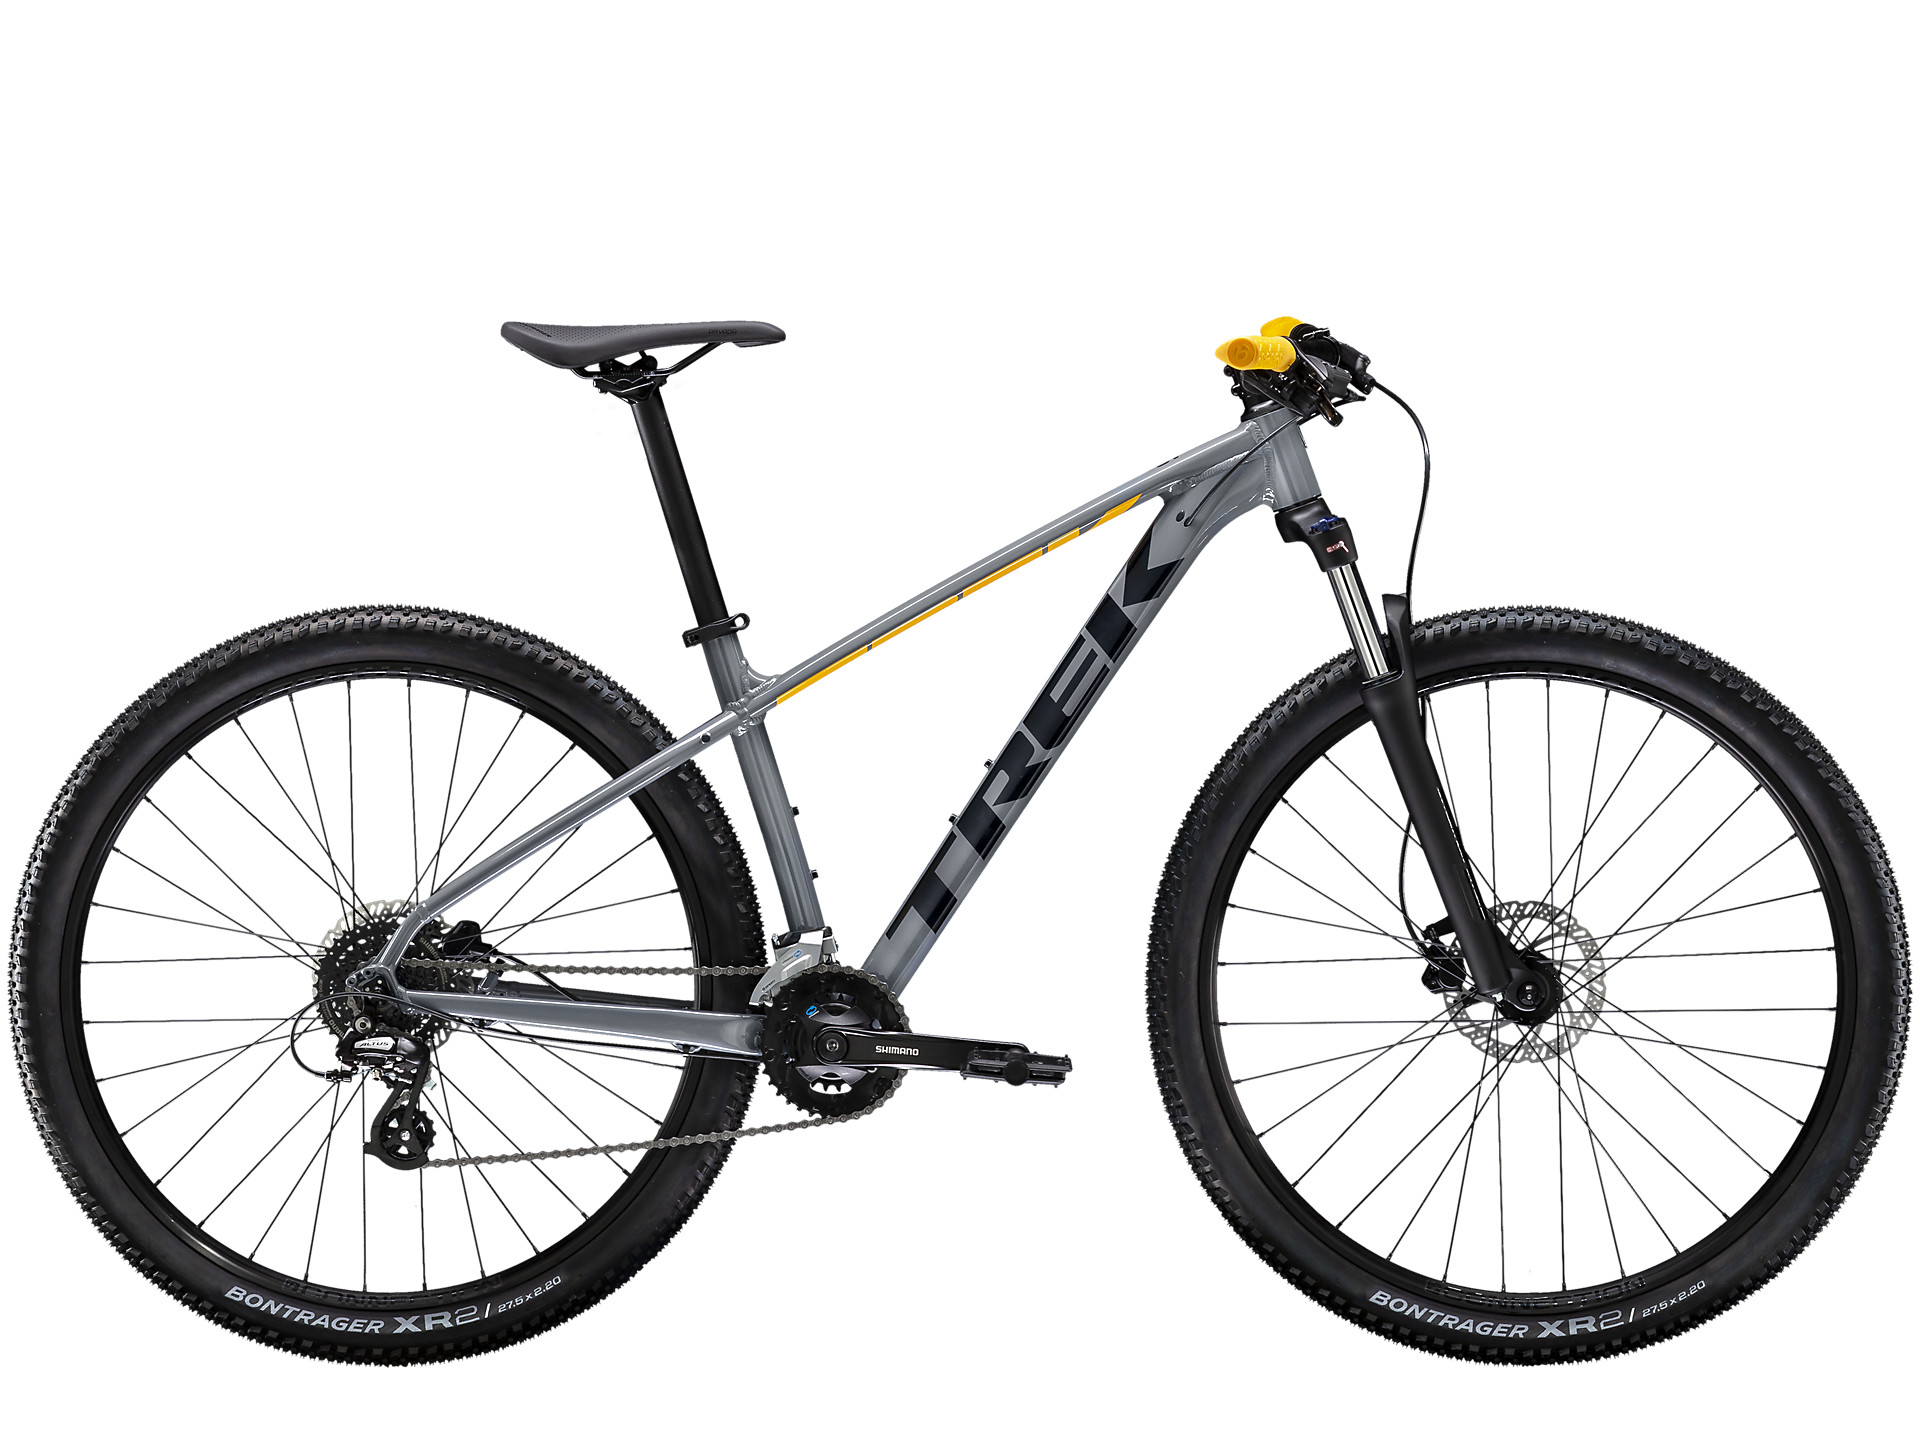 Marlin | Trek Bikes